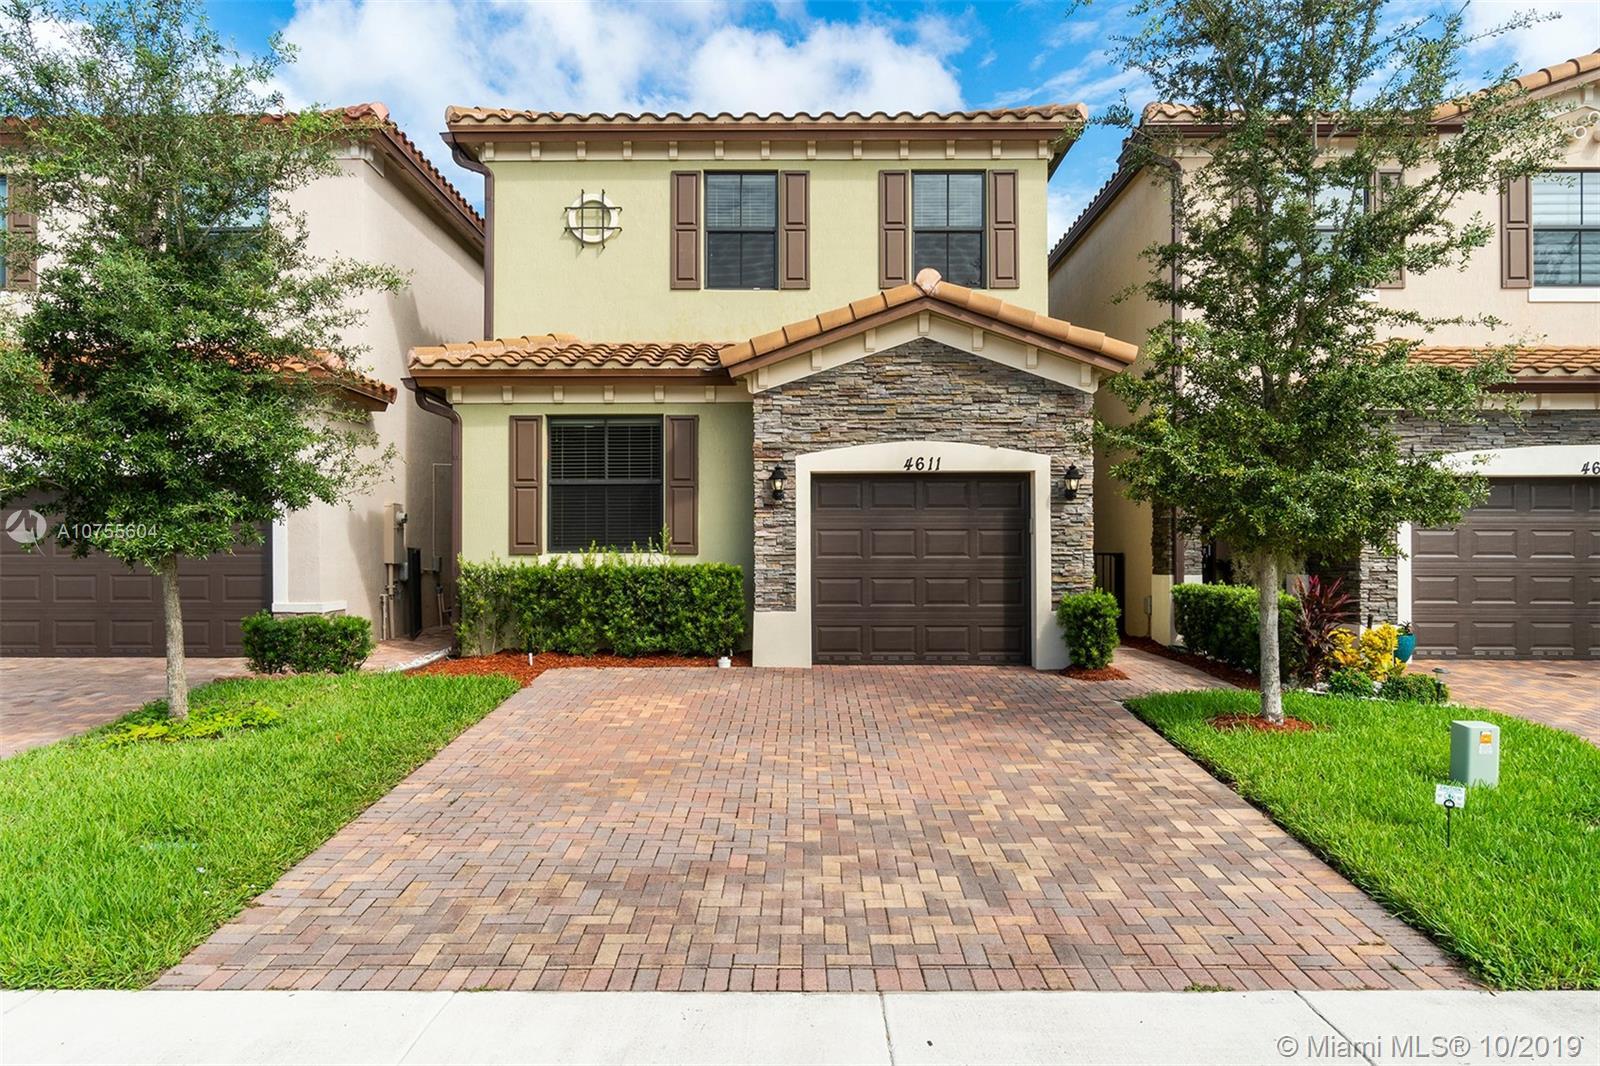 4611 NW 59th St, Tamarac, FL 33319 - Tamarac, FL real estate listing